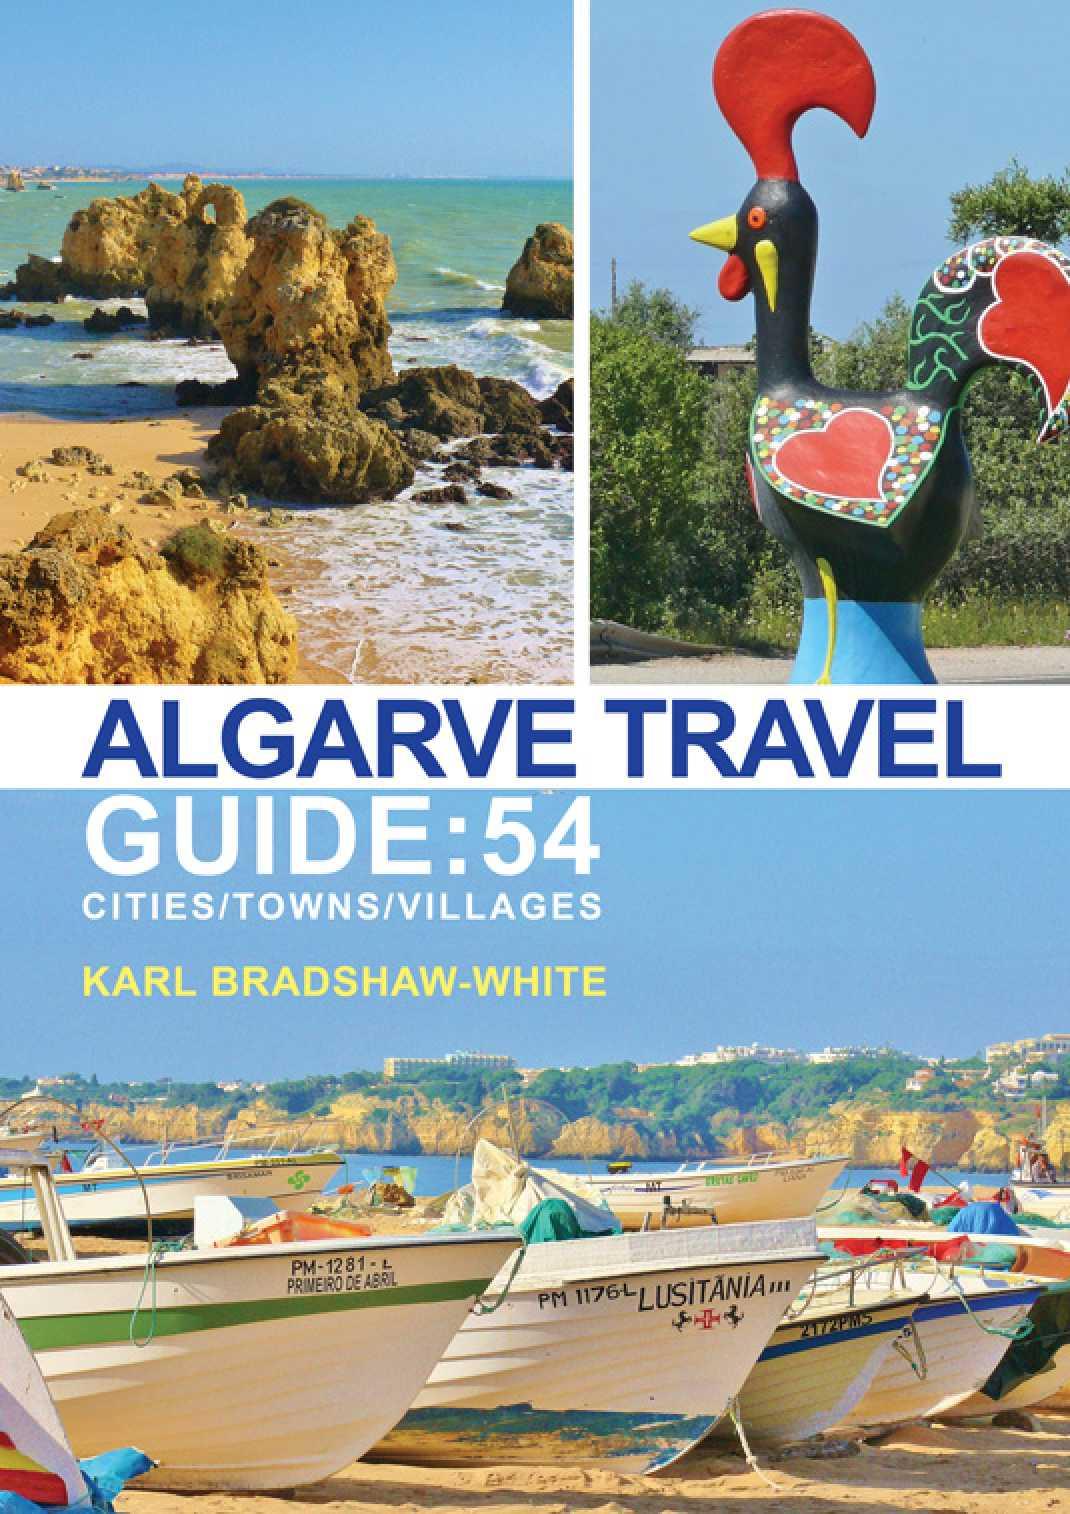 Algarve Travel Guide: 54 Cities/Towns/Villages